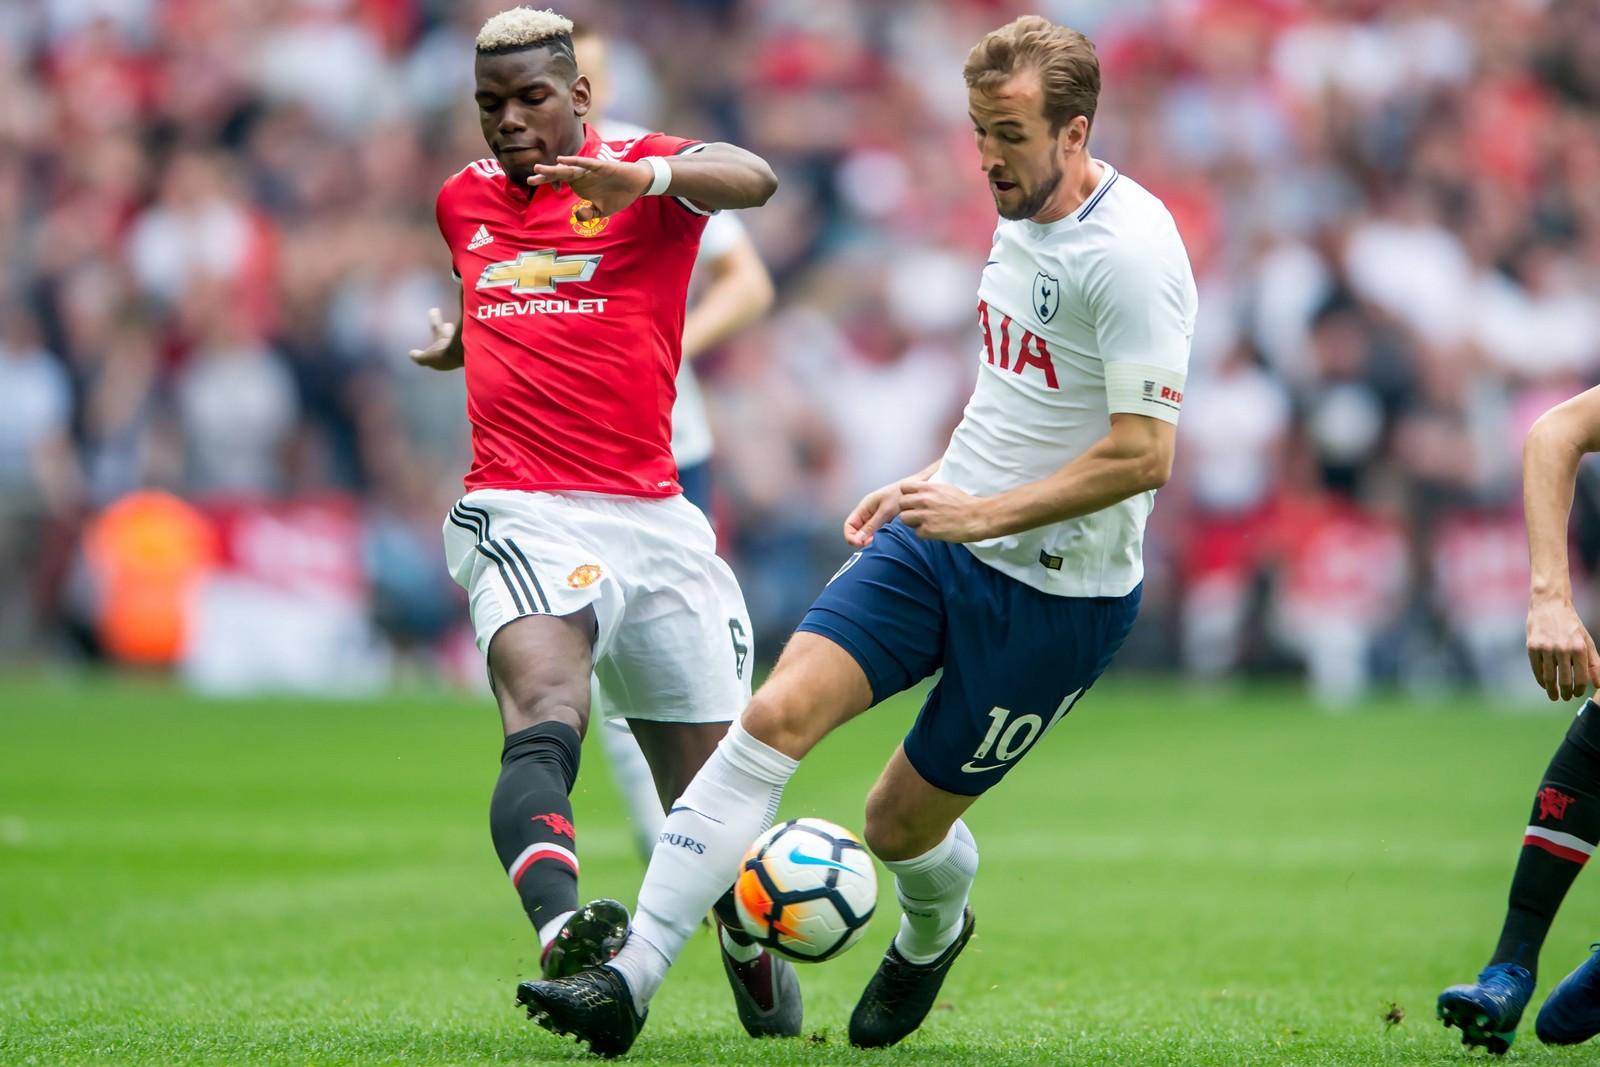 Kann Paul Pogba Harry Kane aufhalten? Jetzt auf ManU vs Tottenham wetten!